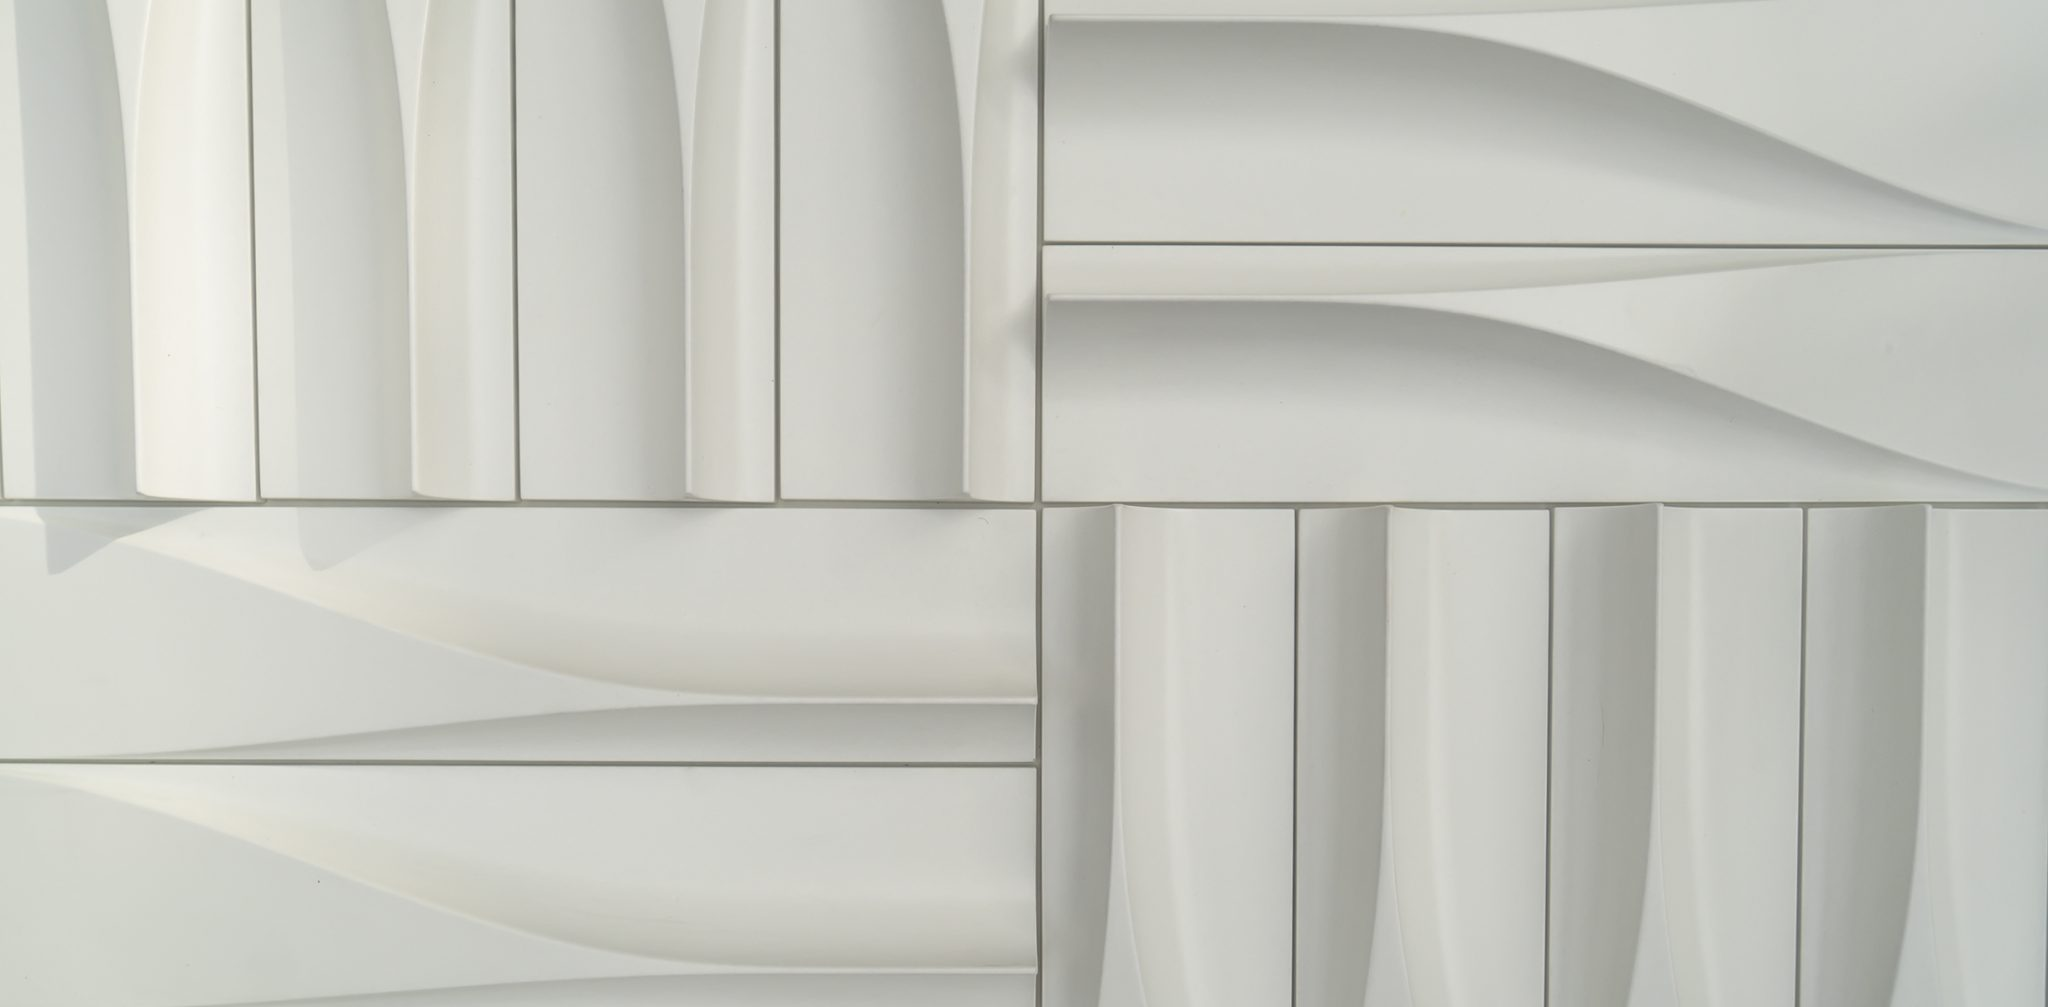 liquid-forms-kazaconcrete-designslide1